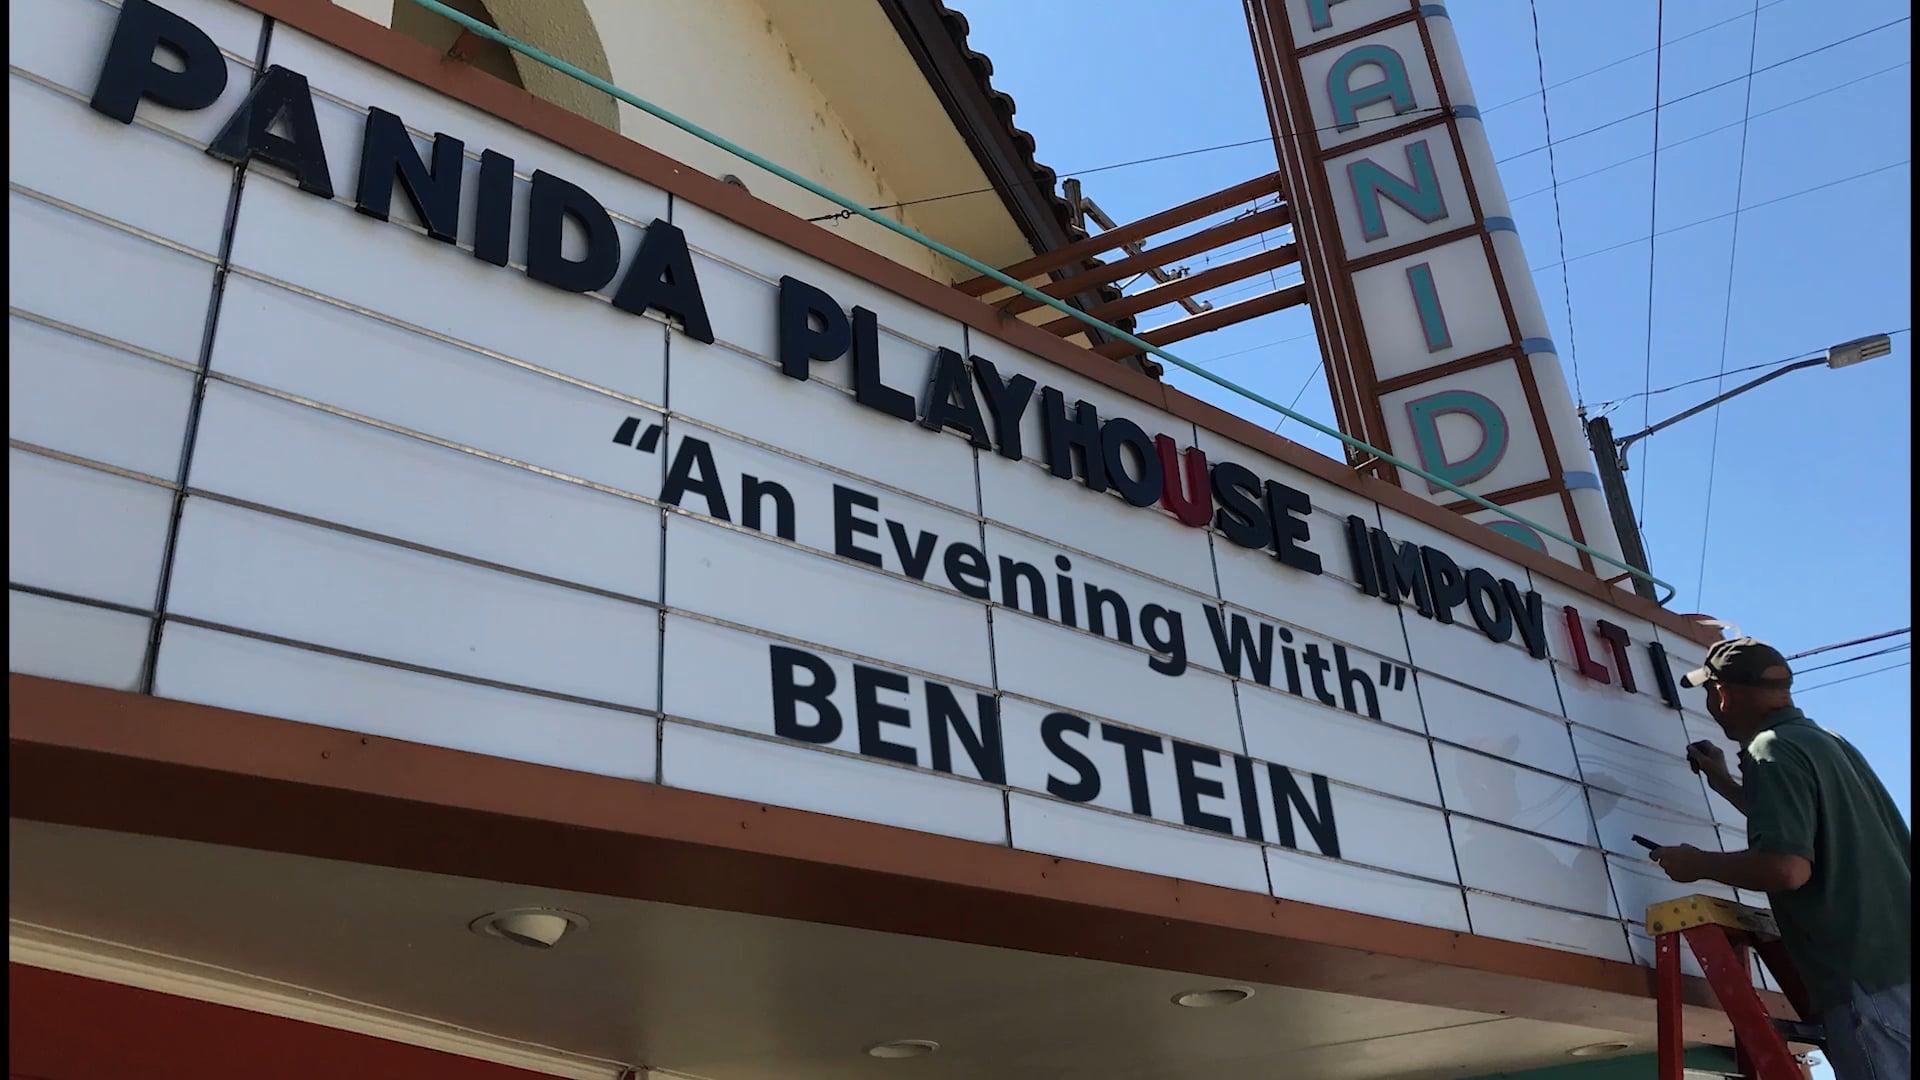 An evening with Ben Stein